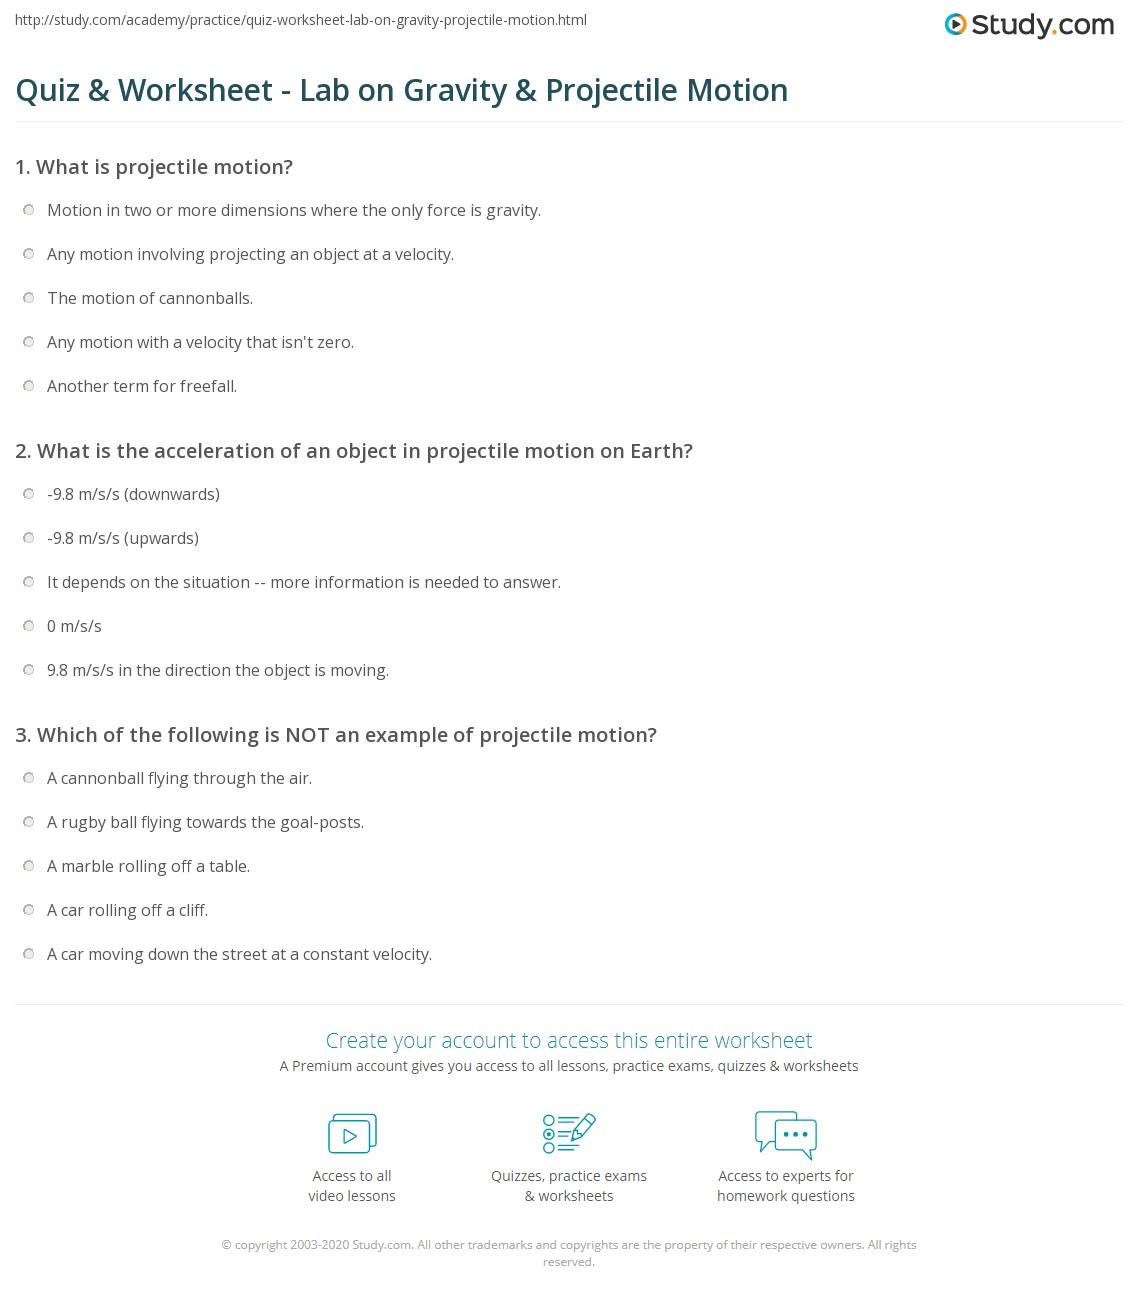 Projectile Motion Worksheet: Quiz & Worksheet   Lab on Gravity & Projectile Motion   Study com,